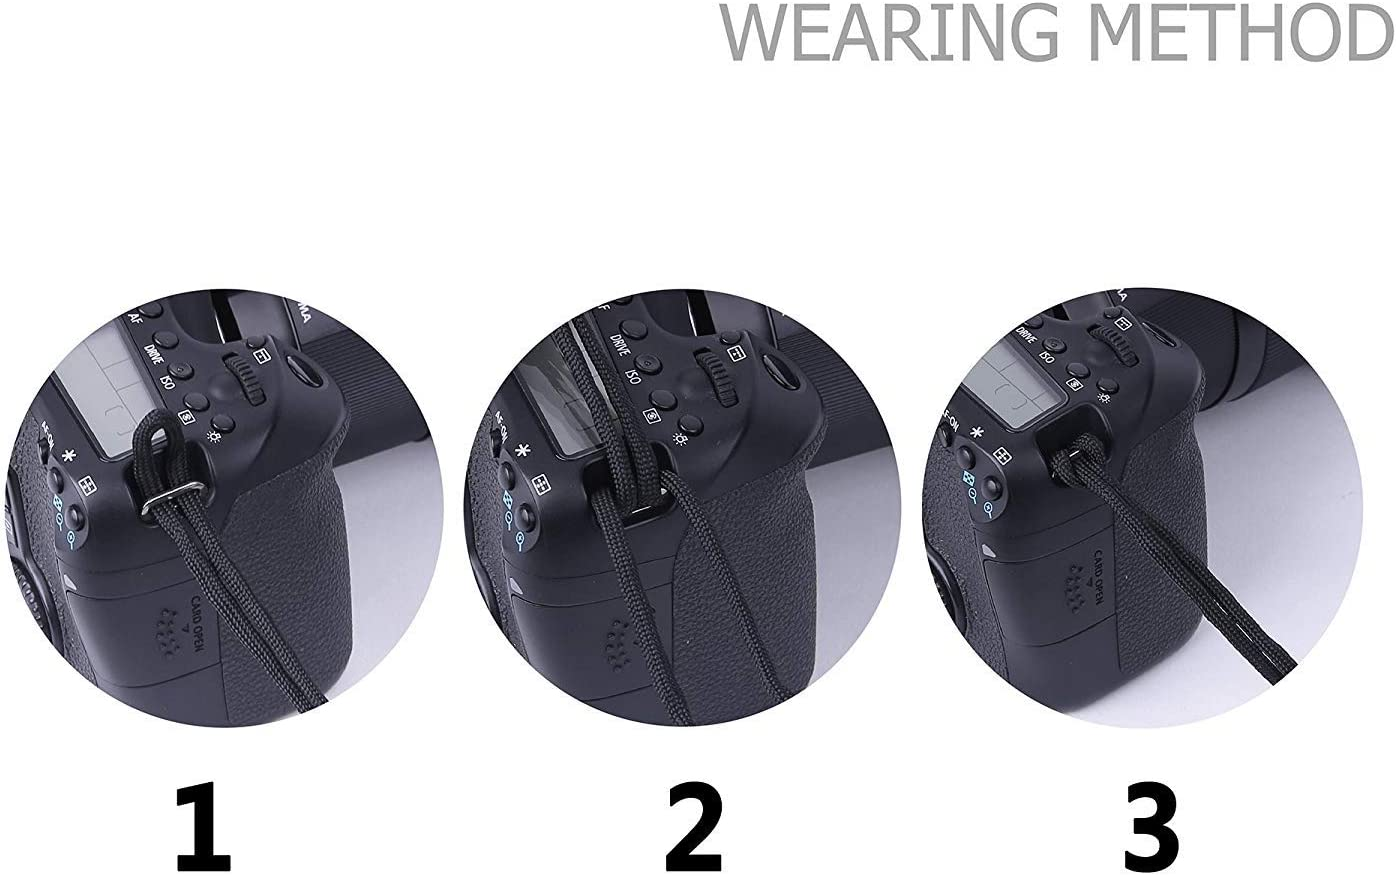 2PACK Adjustable Camera Wrist Strap//Bracelet,Vkermury Braided 550 Paracord for SLR//DSLR Digital Cameras//Binoculars//PSP//Wii and Other Electronic Devices